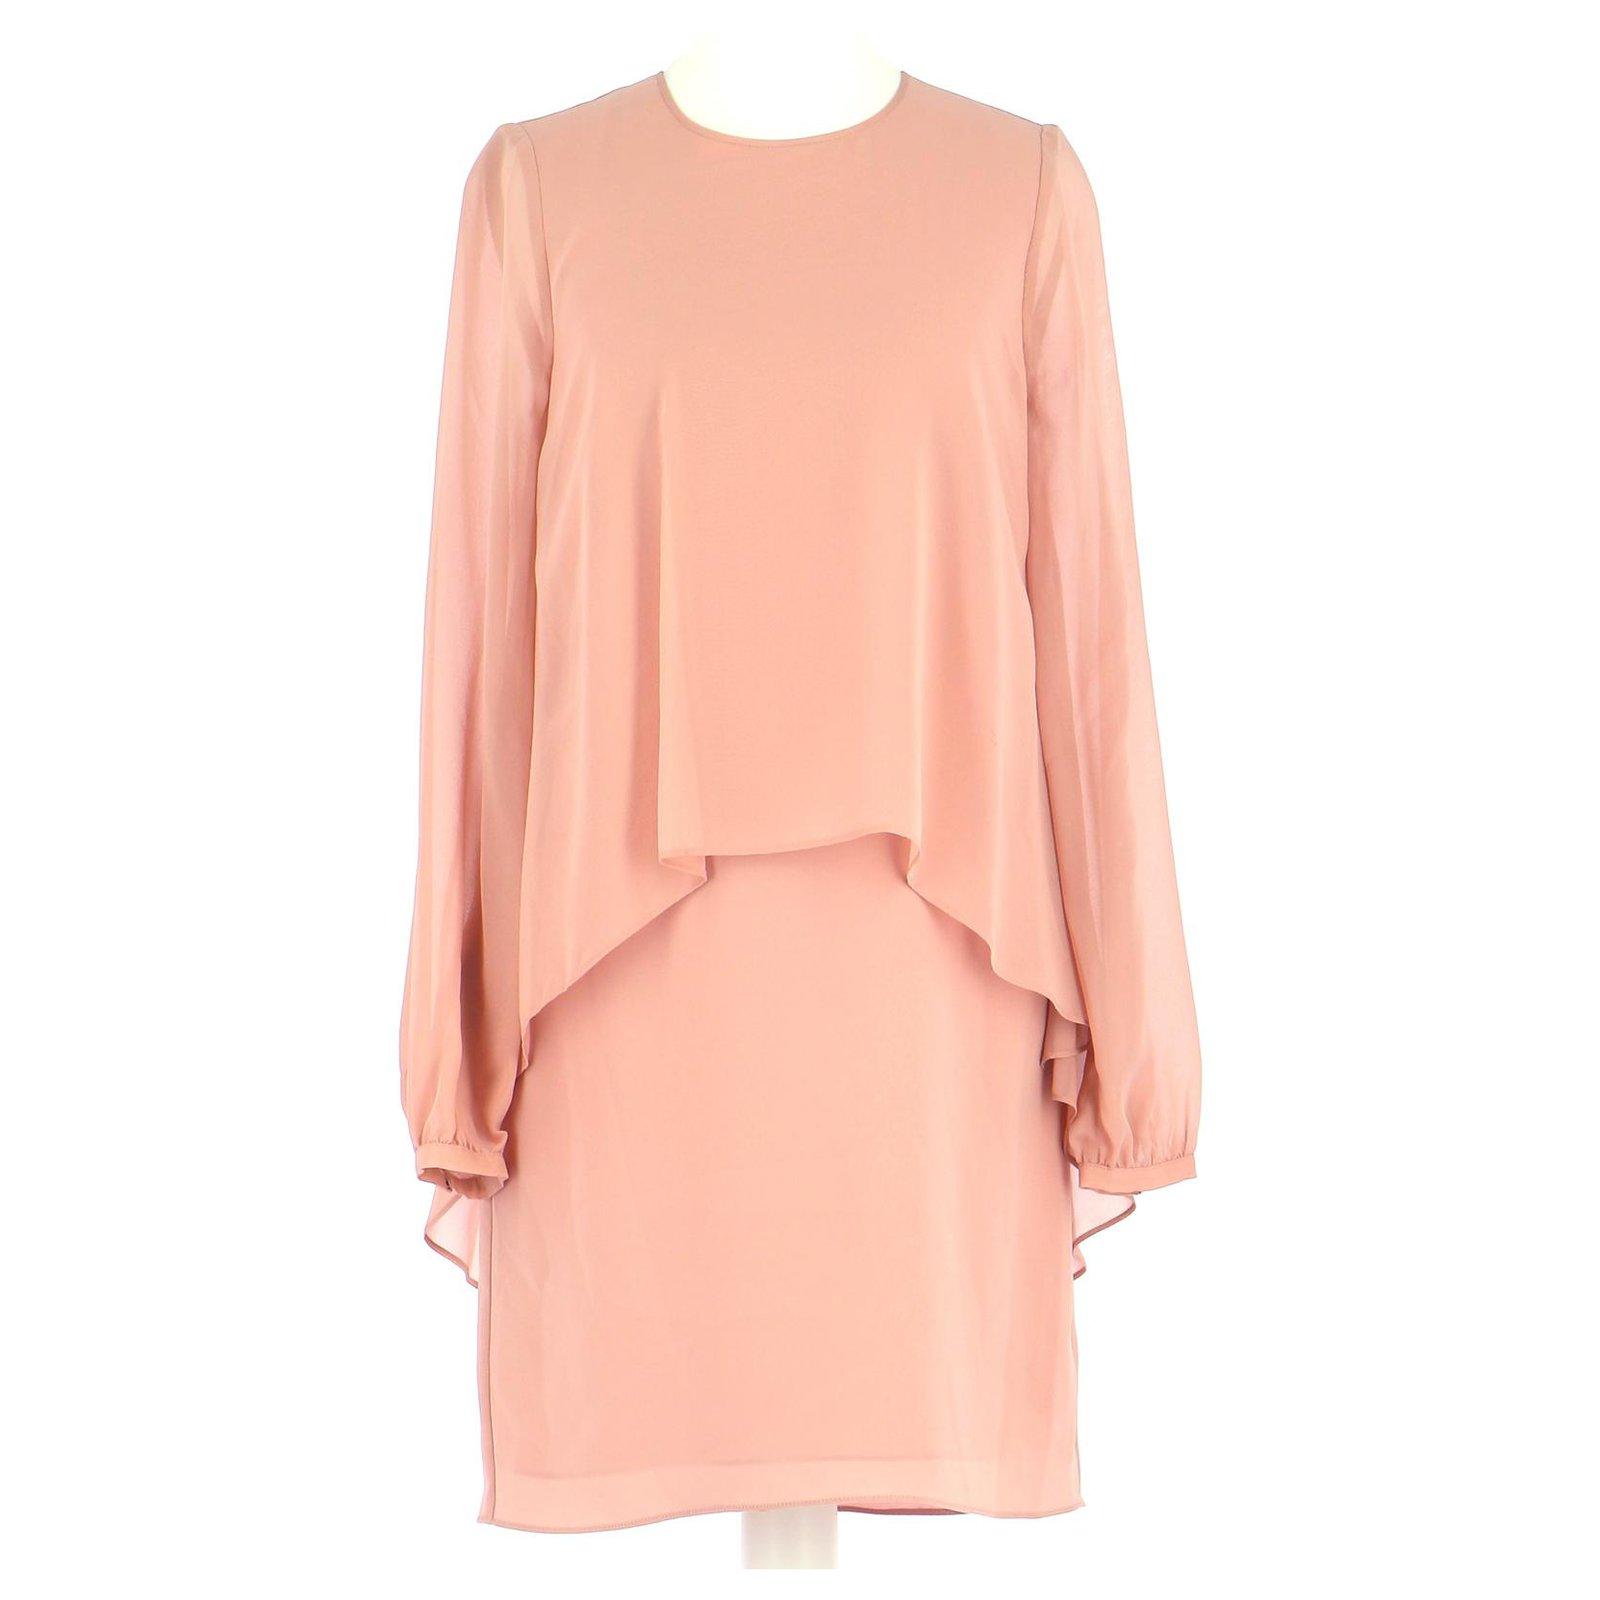 Bcbg Max Azria Robe Dresses Silk Pink Ref 230897 Joli Closet